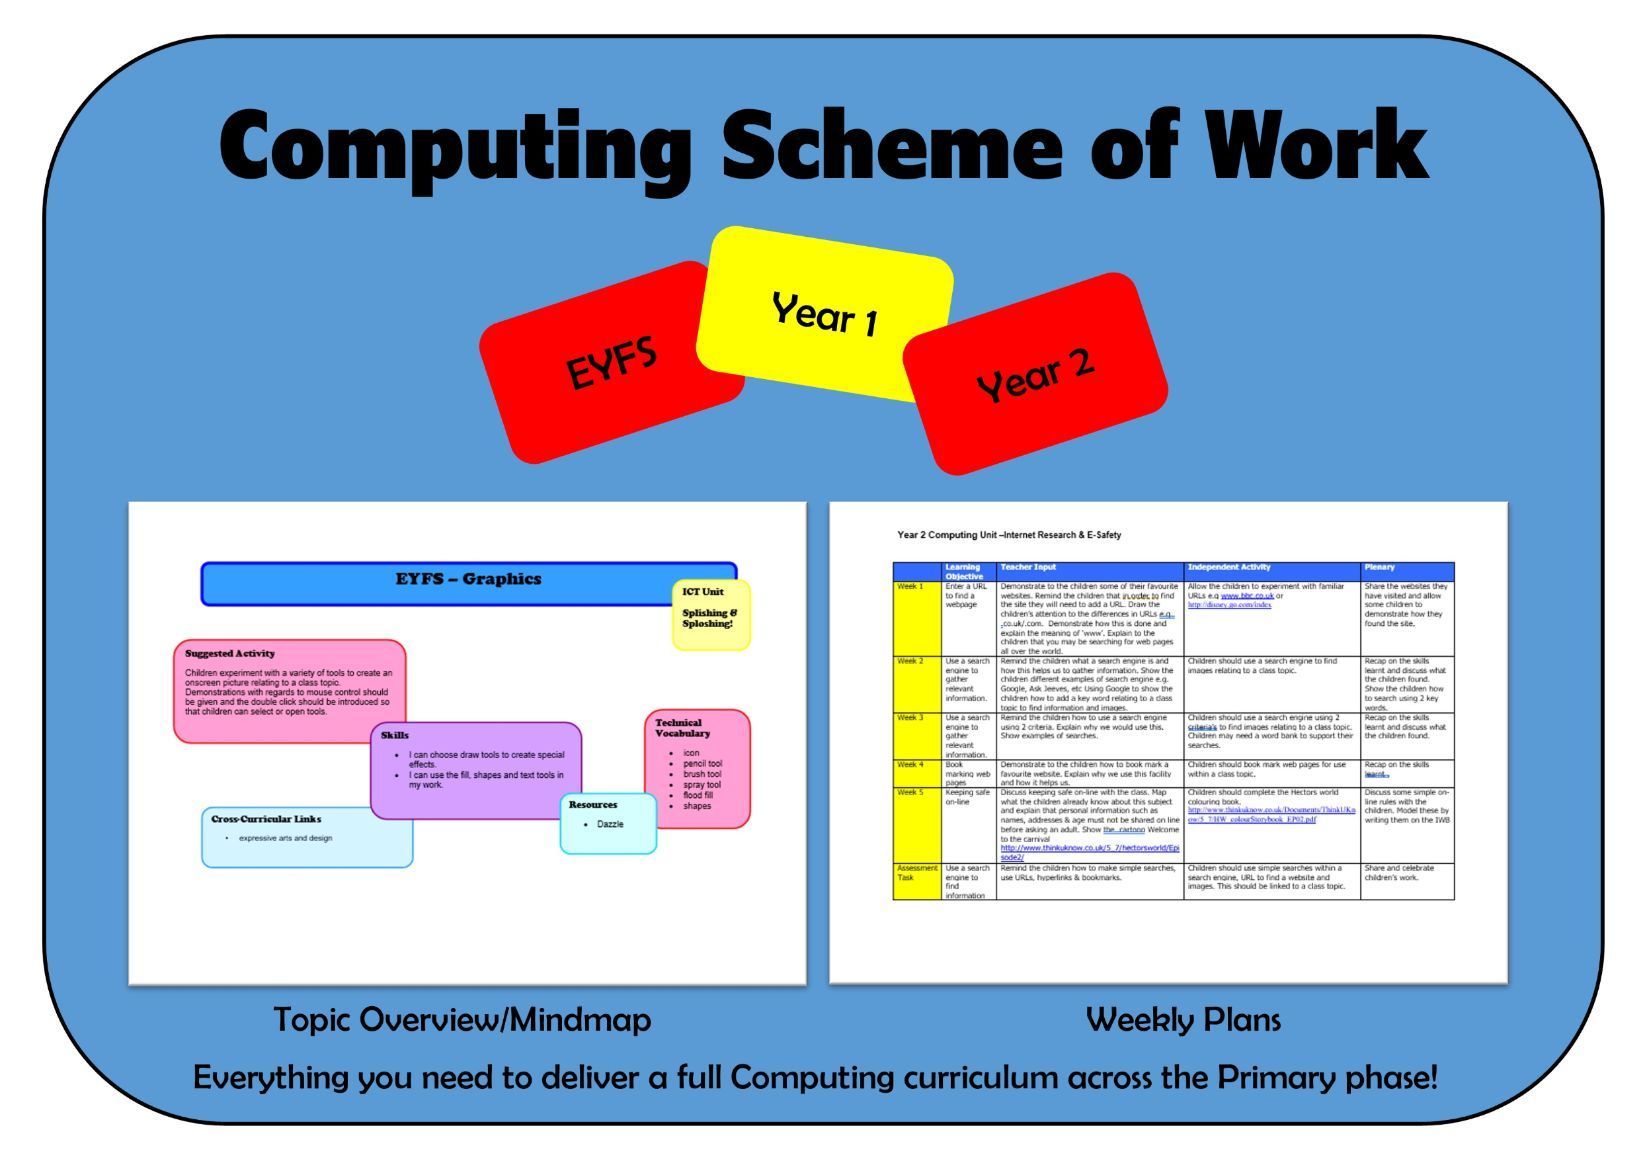 EYFS and Key Stage 1 (KS1) Computing Scheme of Work